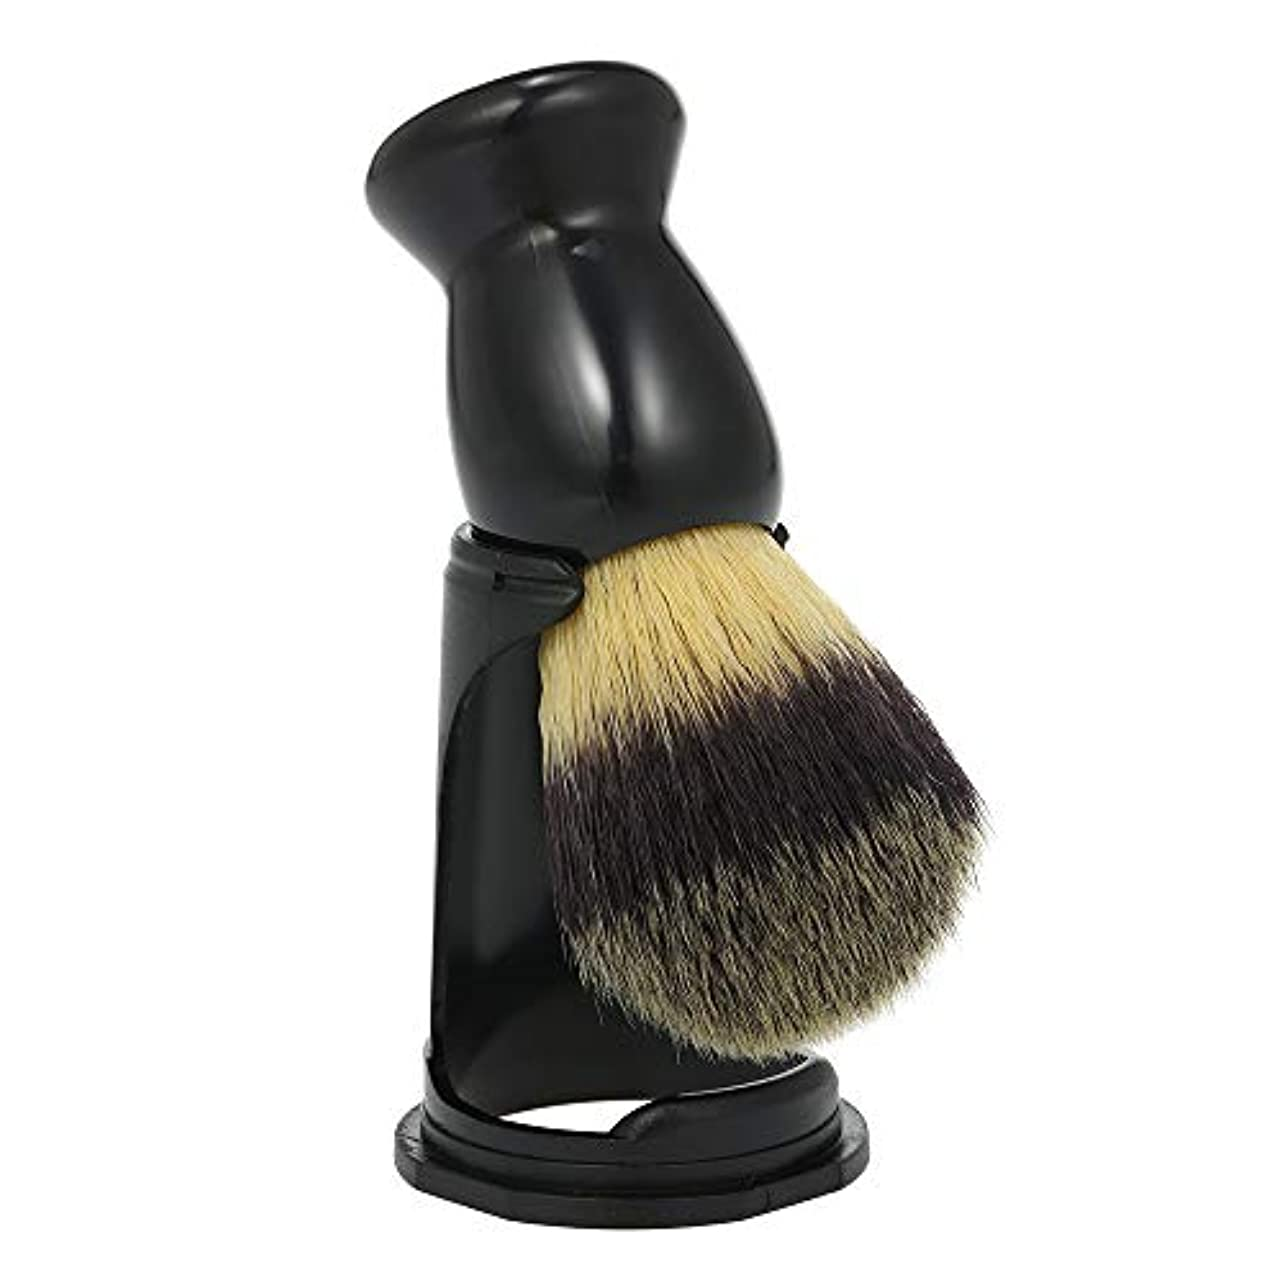 Decdeal ひげブラシ メンズ 髭剃り シェービングブラシ ホルダー スタンド&ブラシ シェービングツール